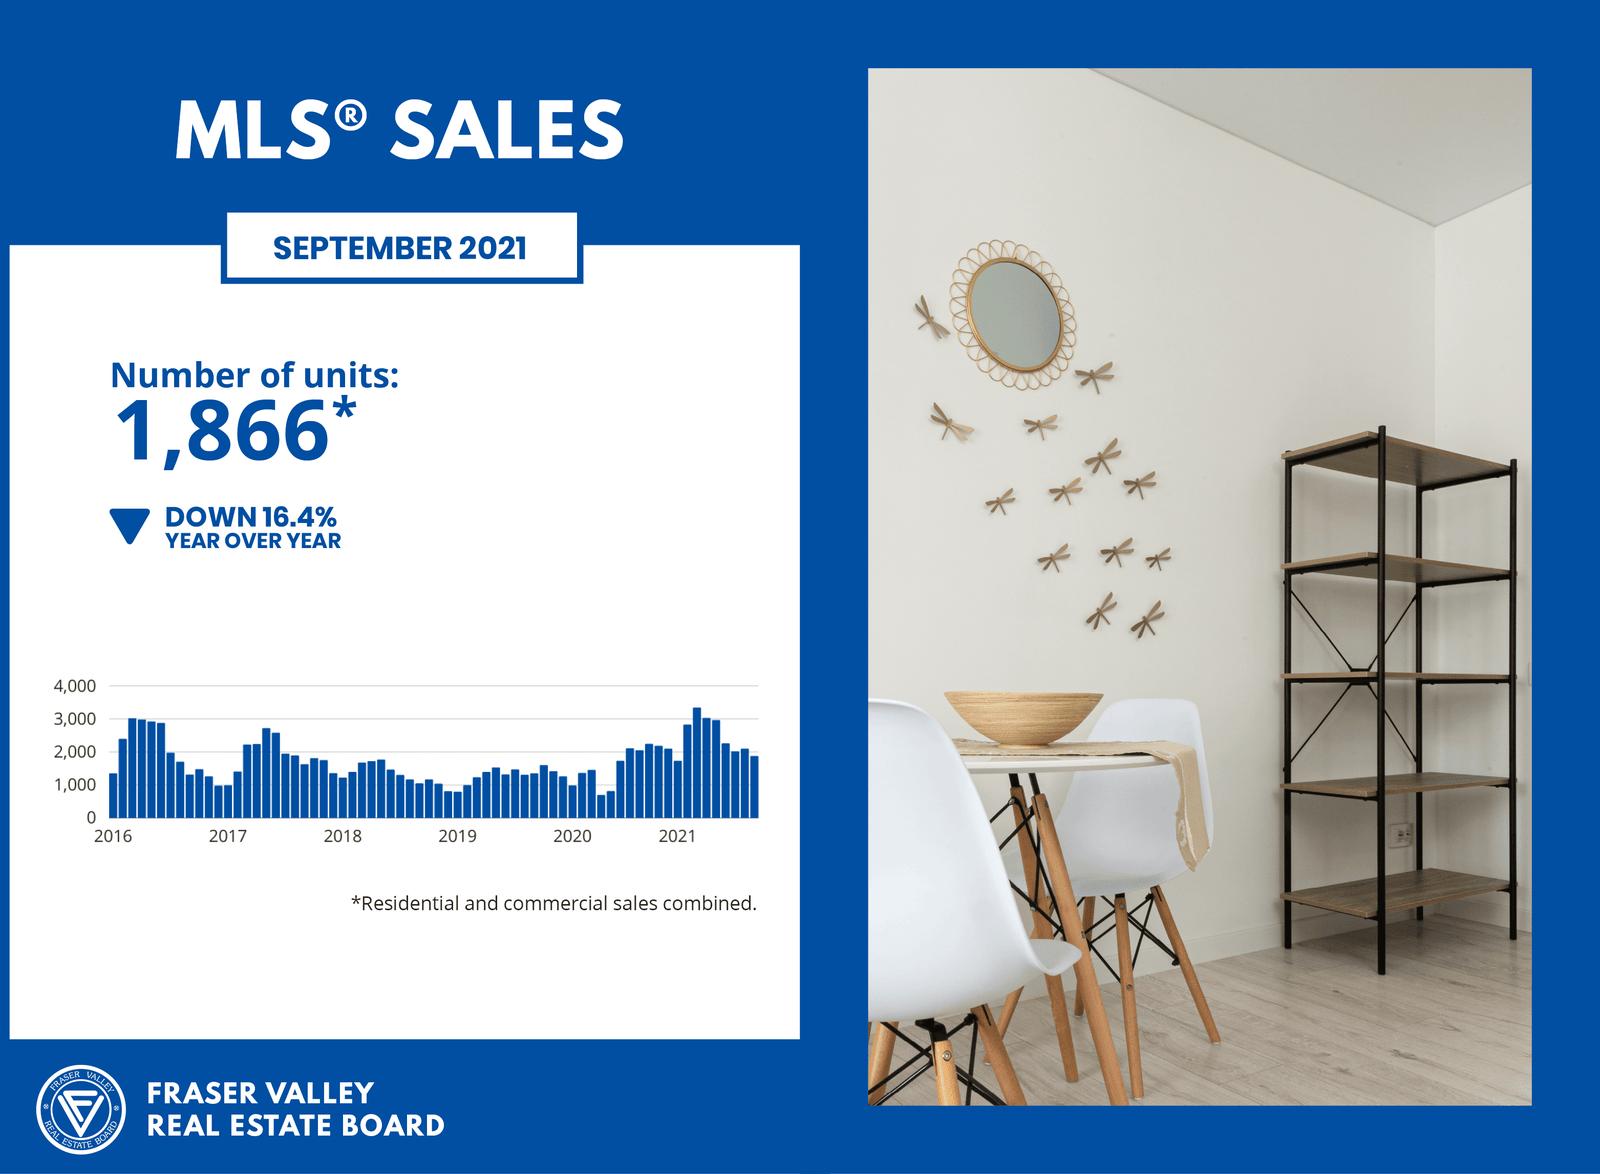 Fraser Valley Housing Market Report - MLS Sales - September 2021